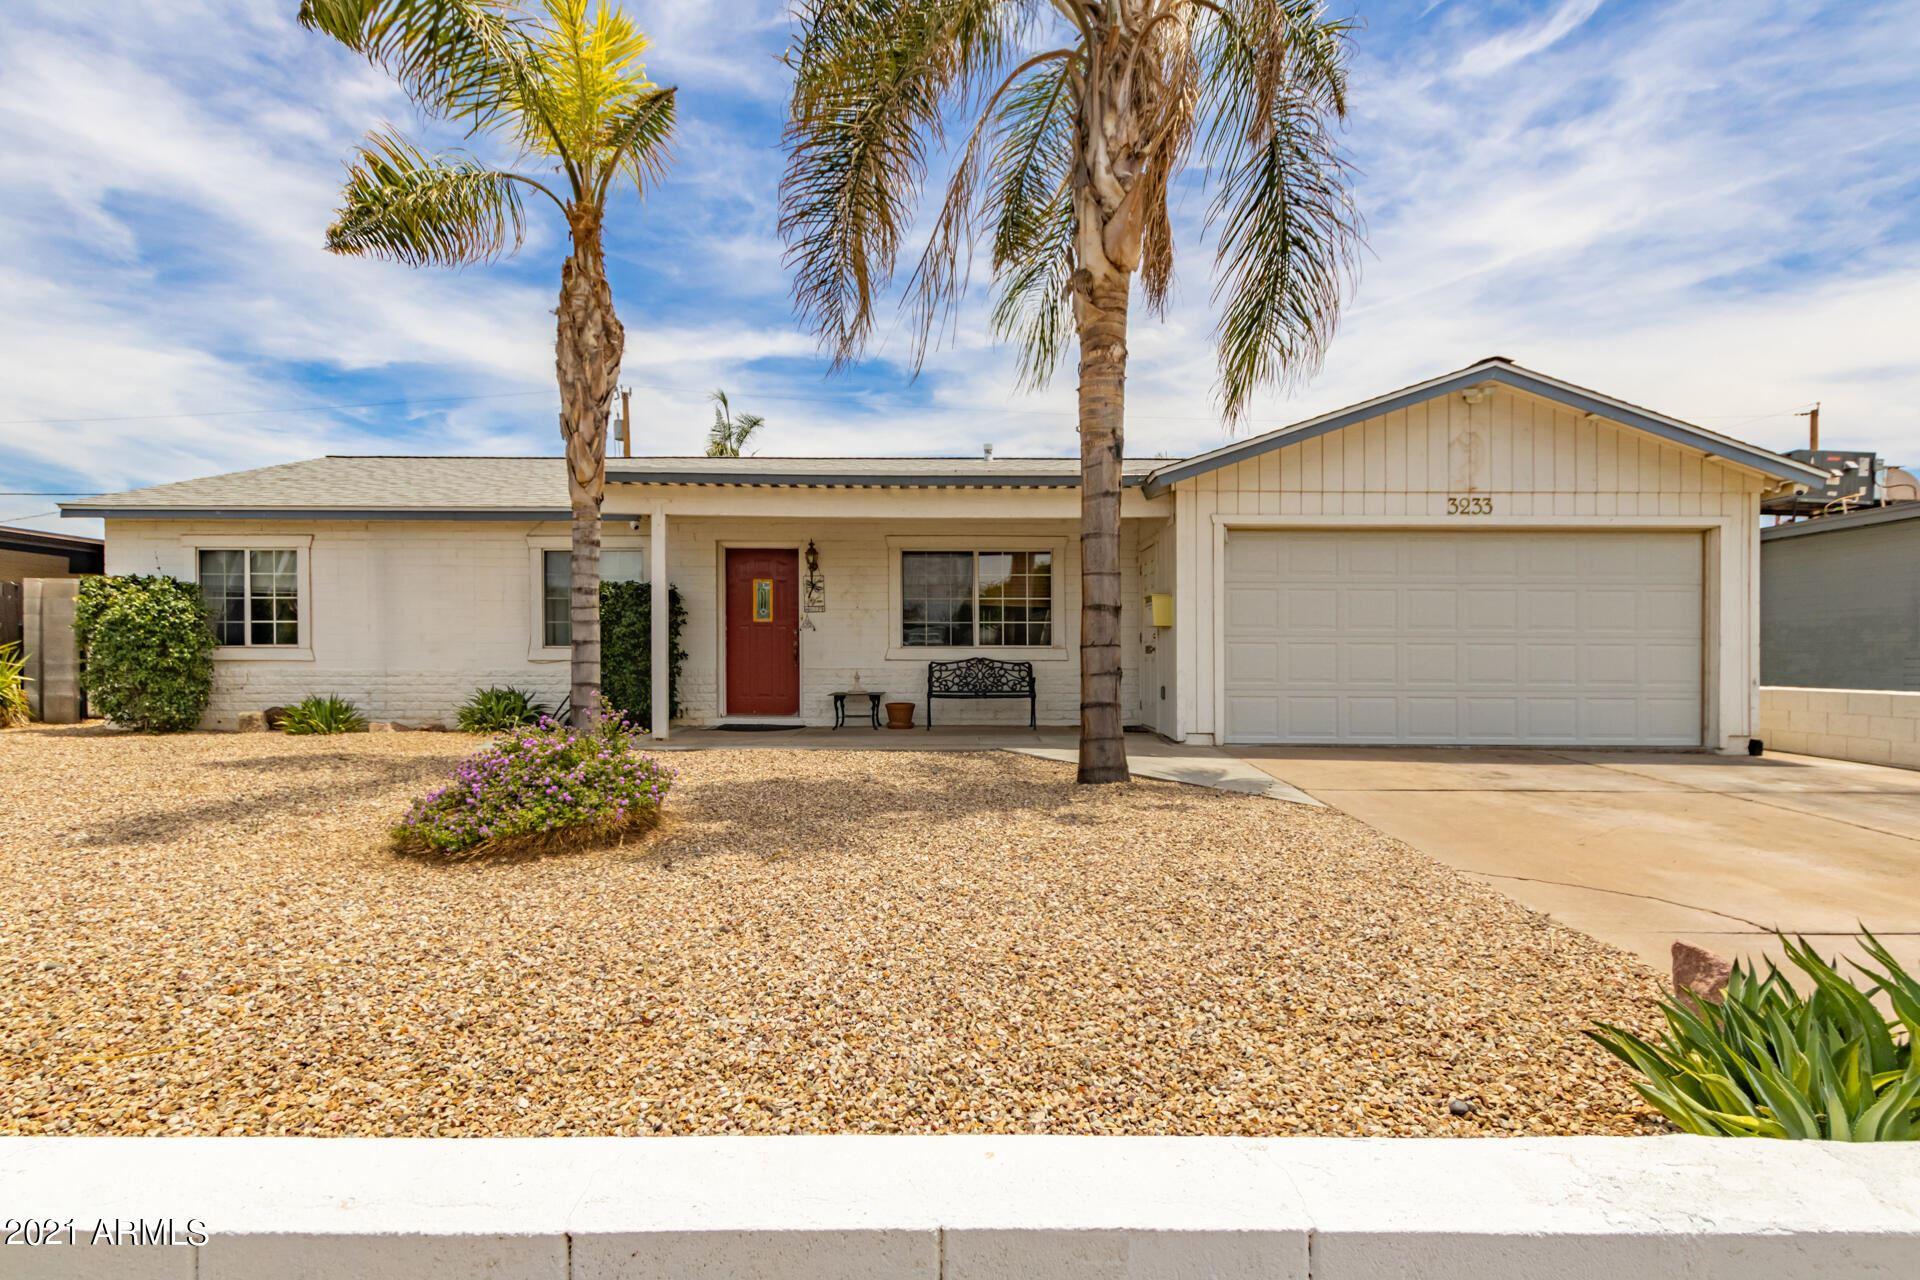 3233 W ALTADENA Avenue, Phoenix, AZ 85029 - MLS#: 6249306